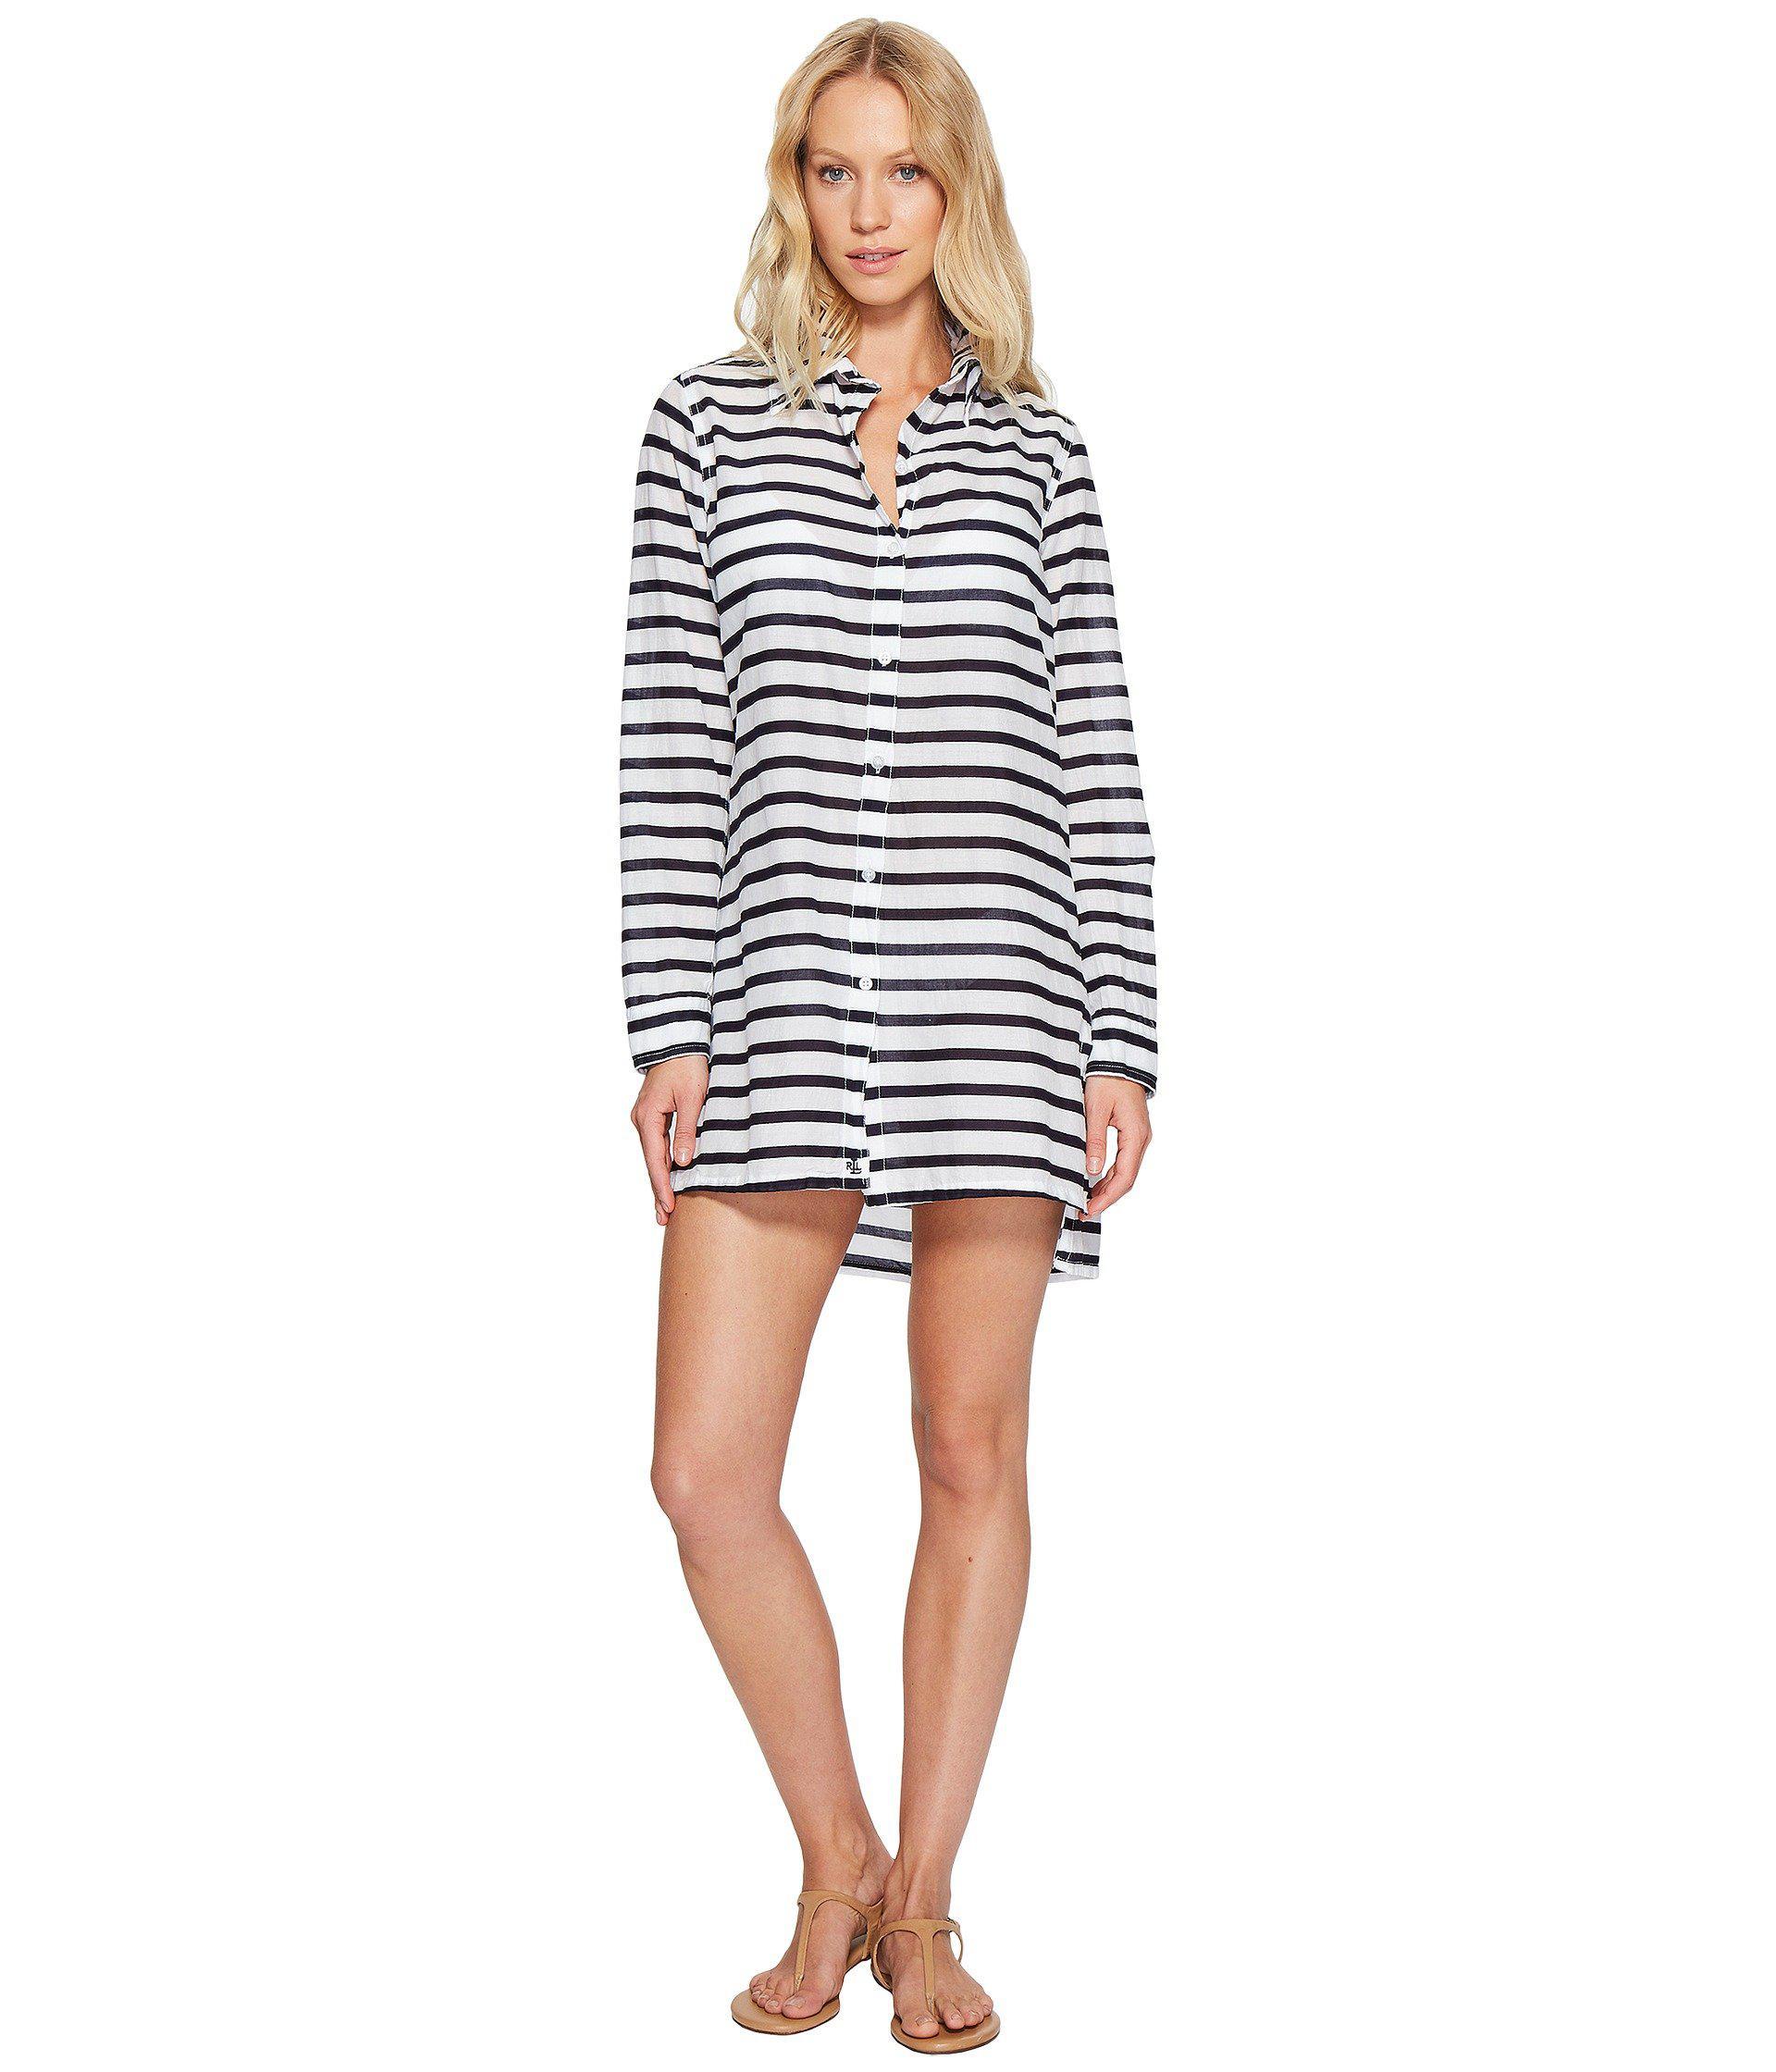 861873073f3 Lyst - Lauren By Ralph Lauren Stripe Crushed Cotton Camp Shirt Cover ...